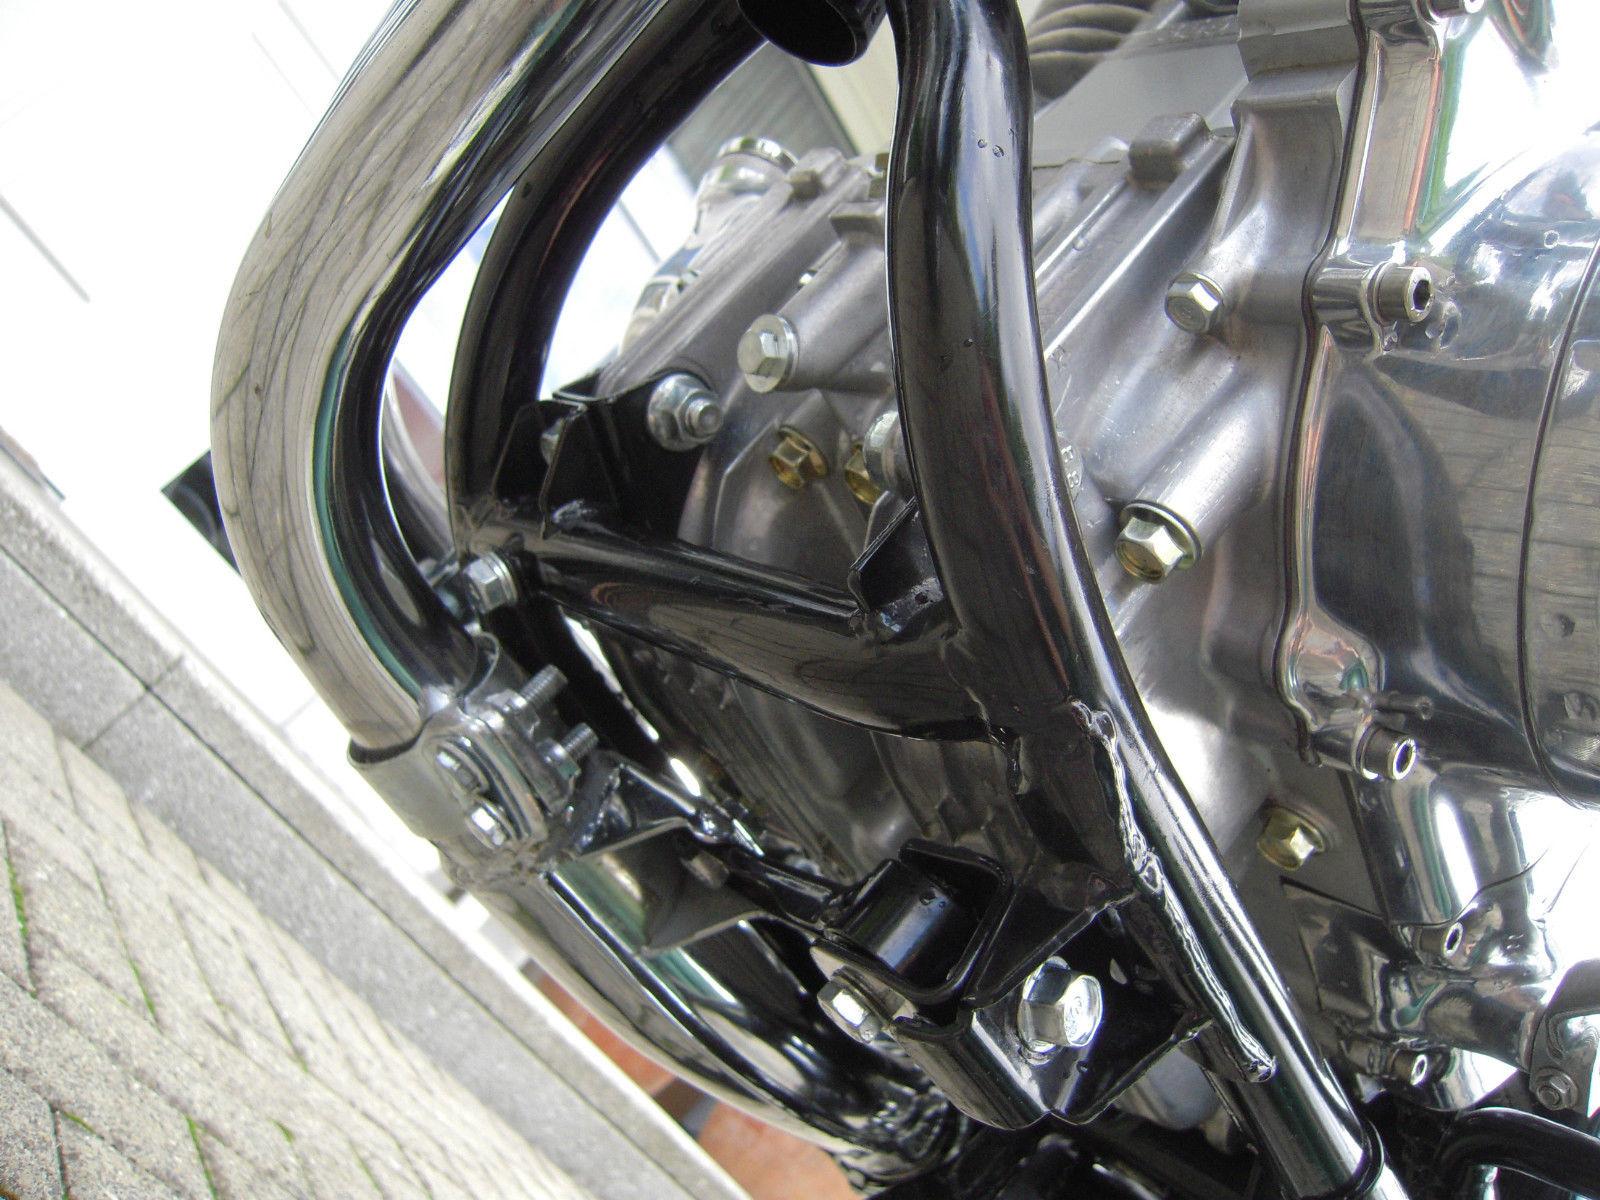 Honda CB360 - 1979 - Underside, Engine Cases and Powder-Coated Frame.